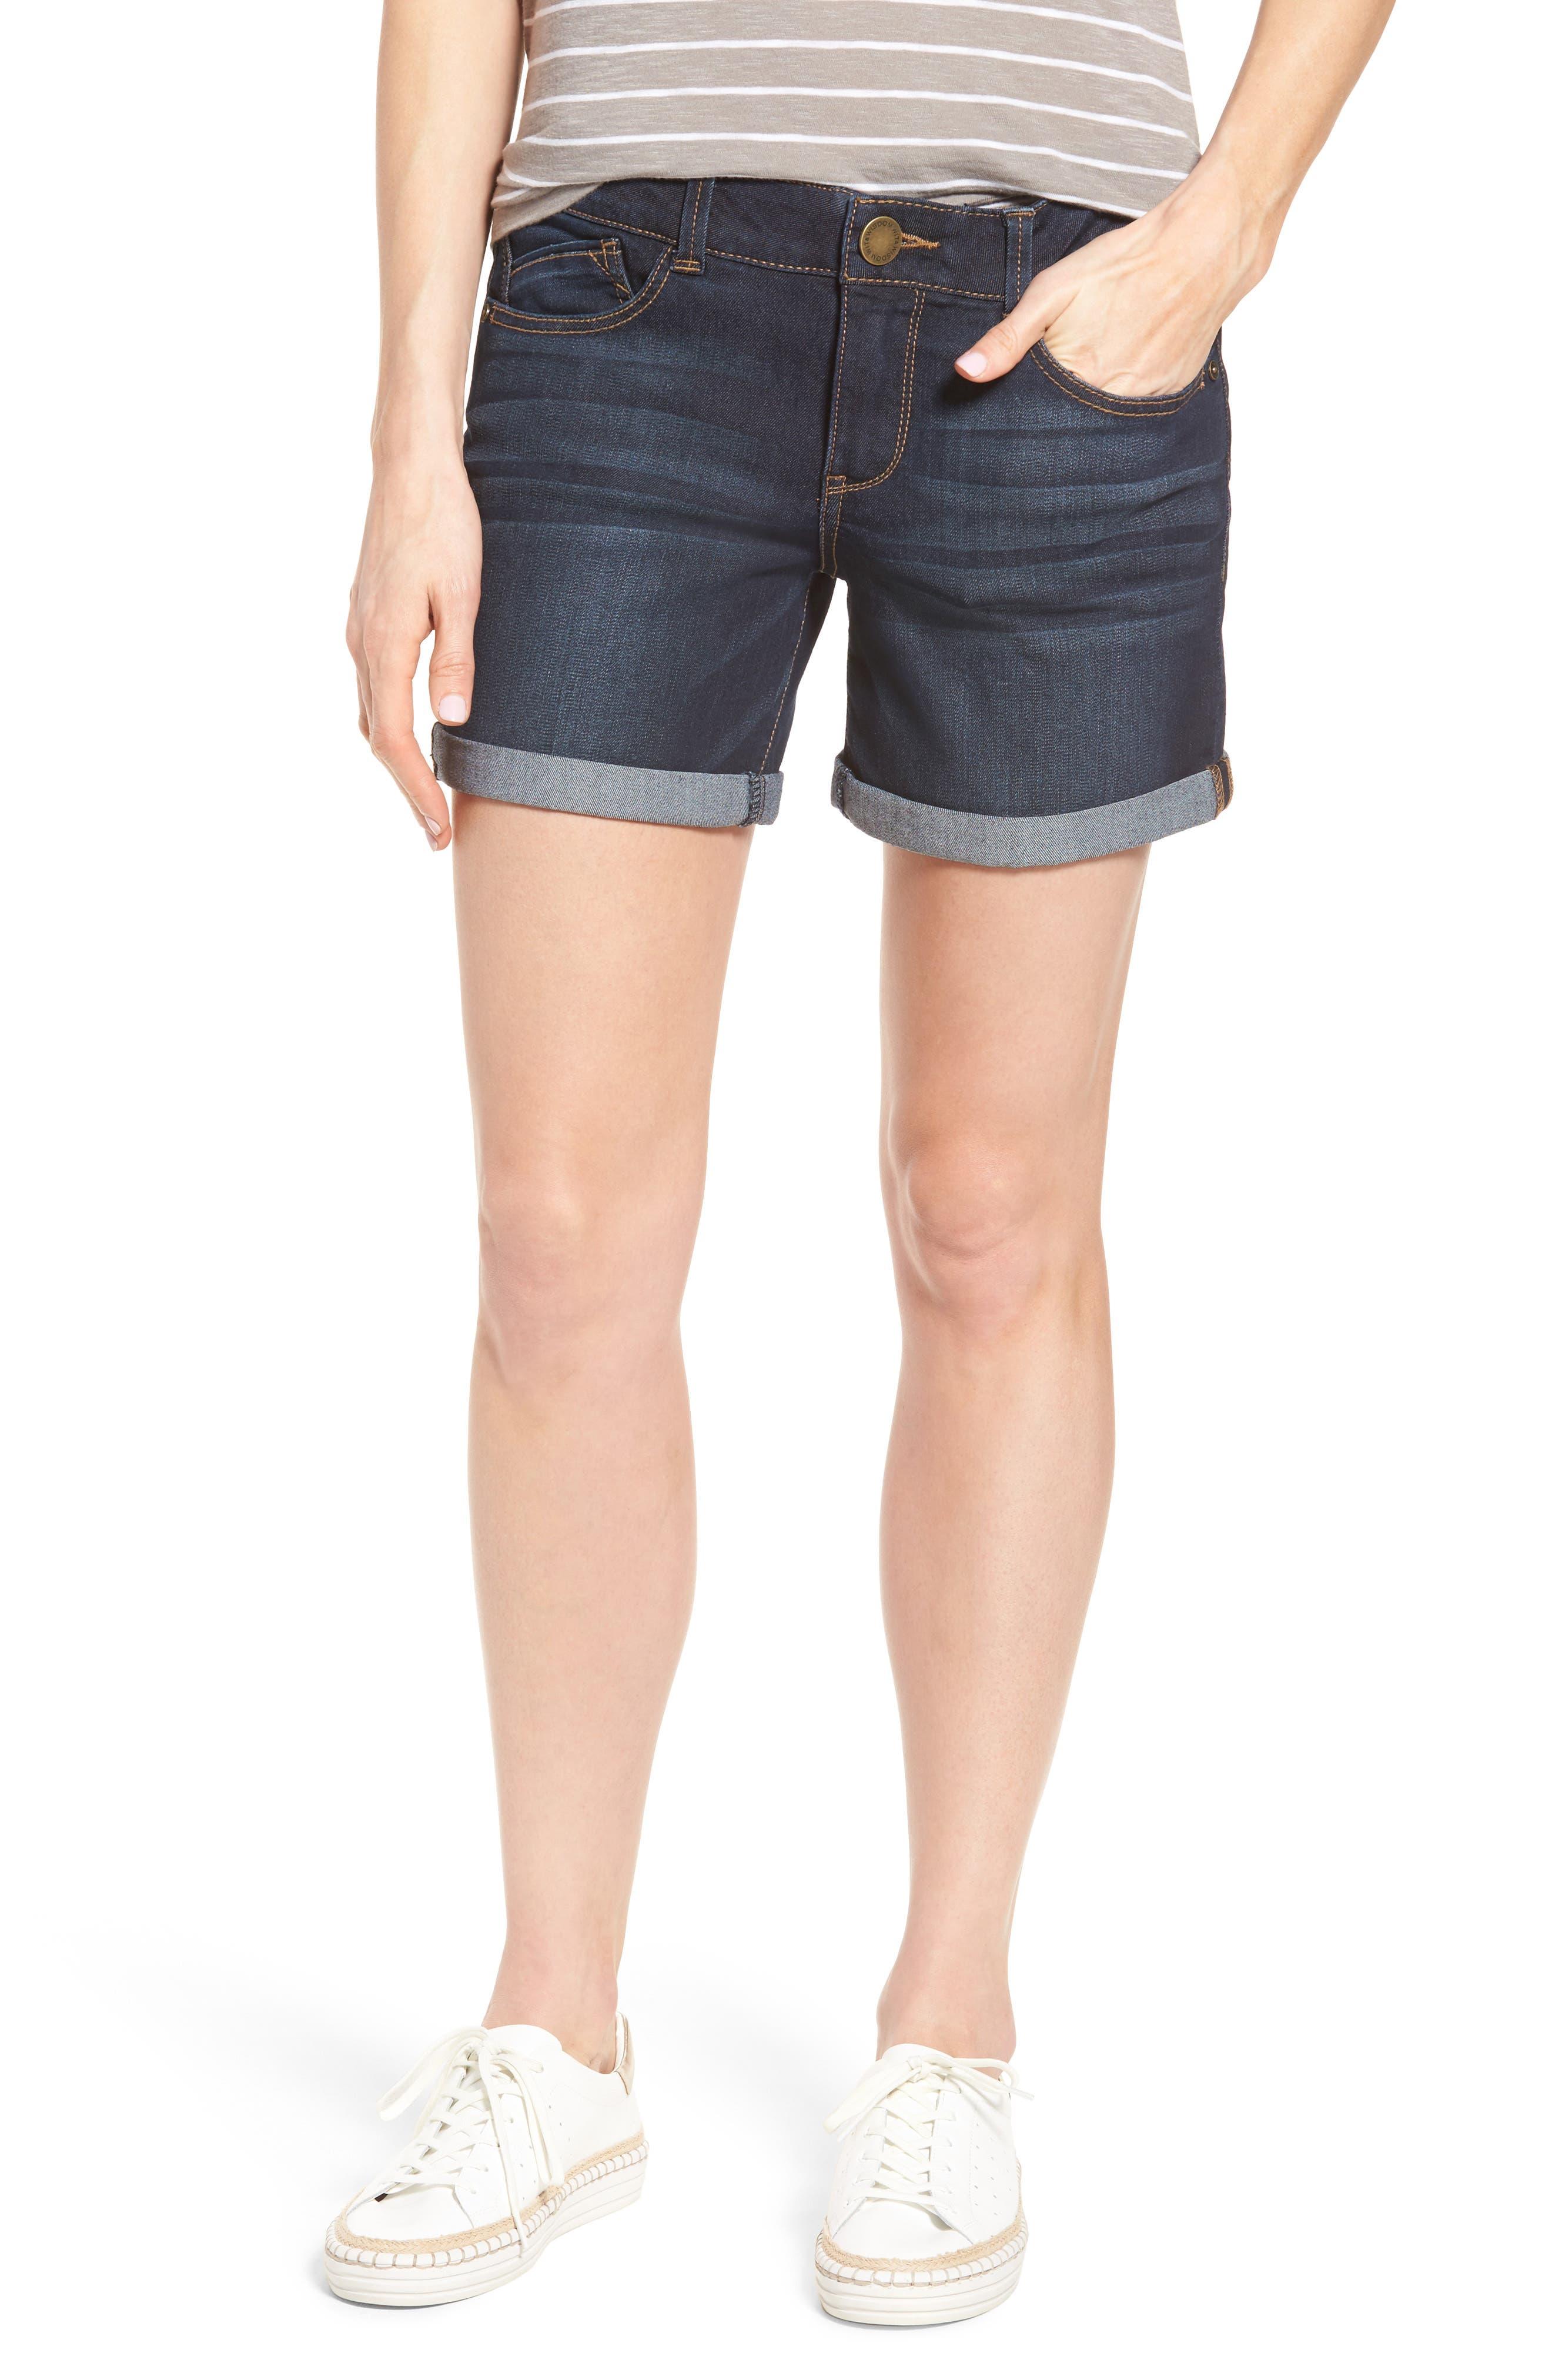 Ab-solution Cuffed Denim Shorts,                         Main,                         color, 402